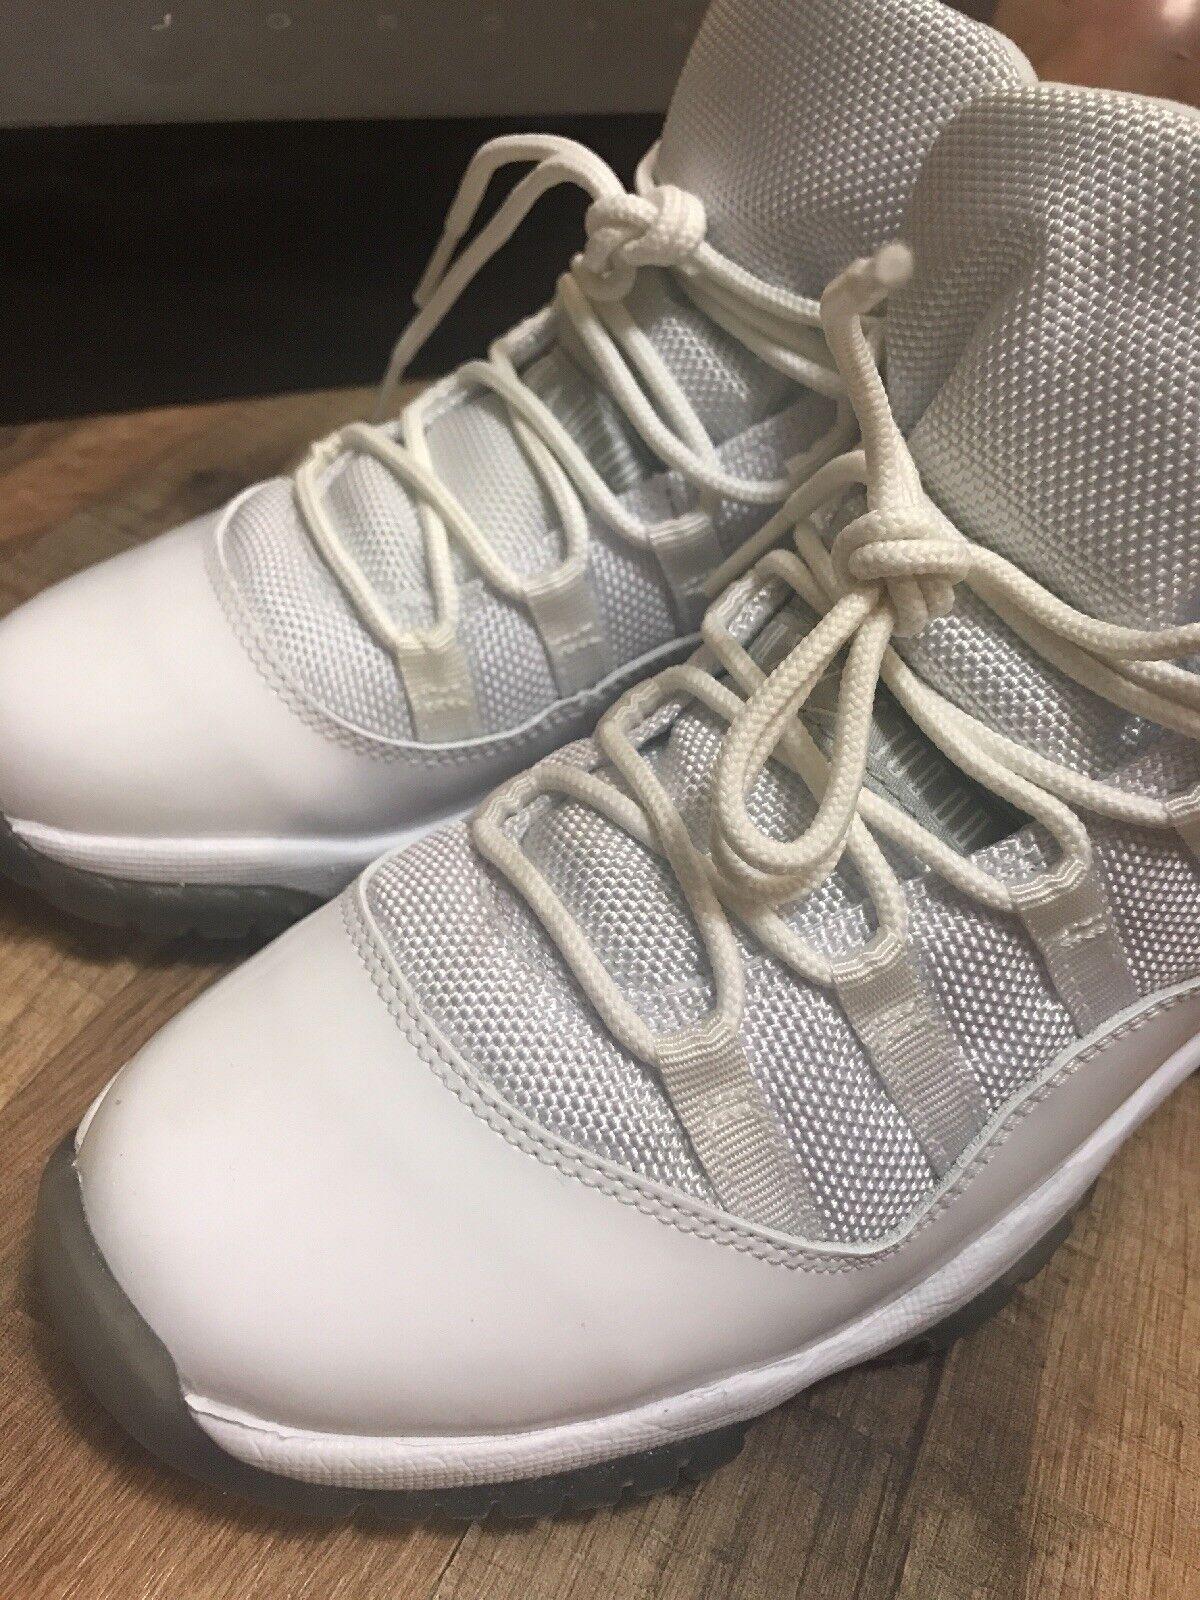 2010 Nike Air Jordan 11 25TH RETRO 25TH 11 ANNIVERSARY SUPREME 378038 101  SIZE 4.5 Y 914e9d